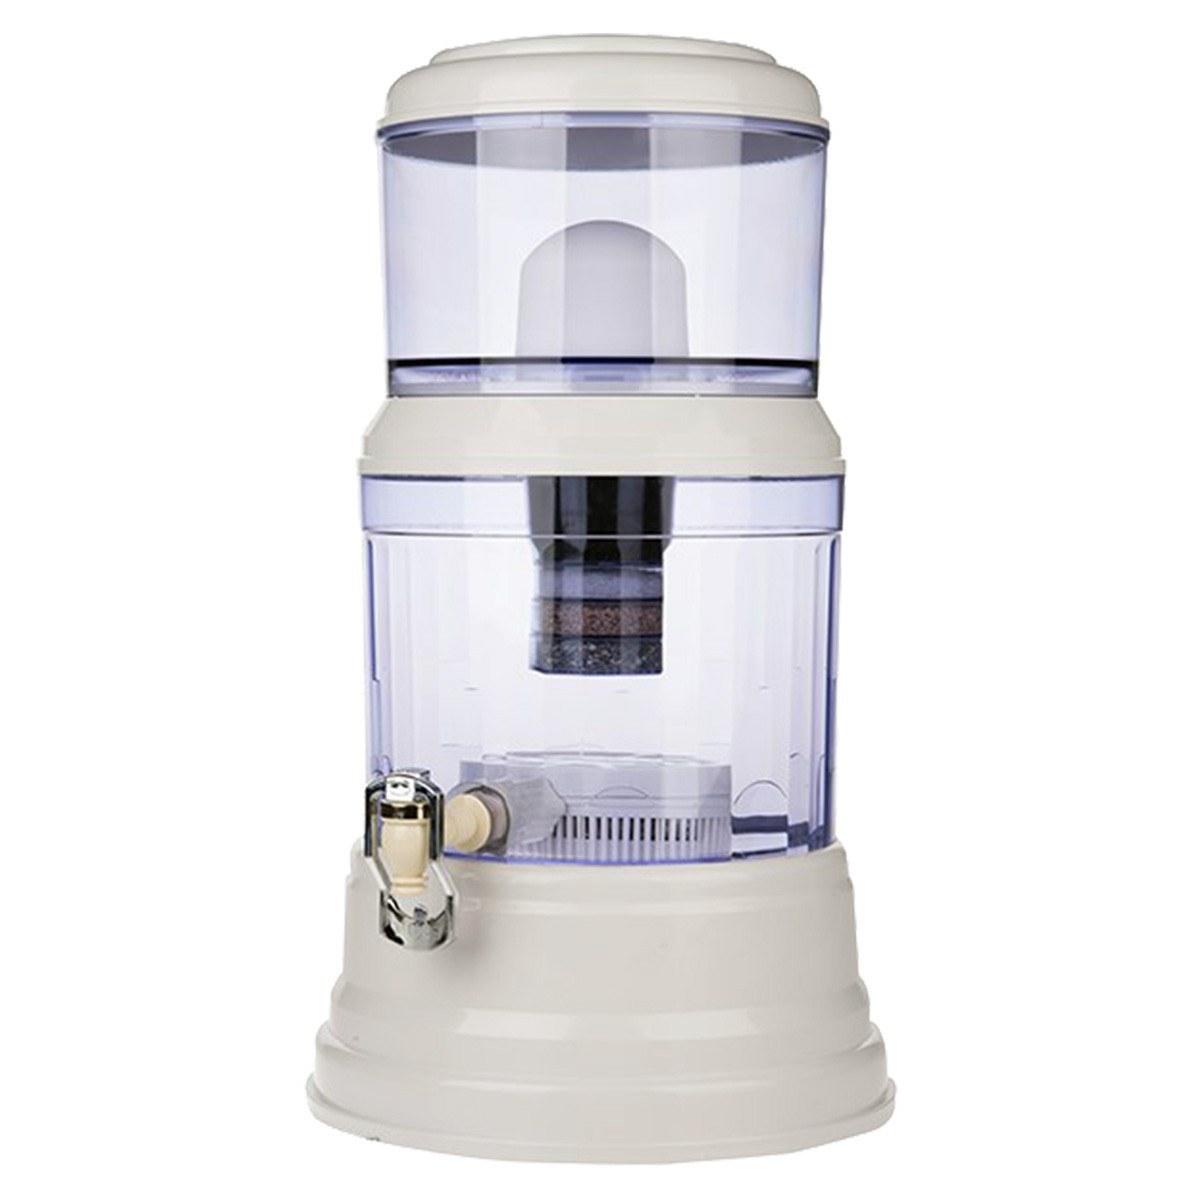 تصویر تصفيه آب روبن Roben 1200BEP Water Purifier یازده مرحله